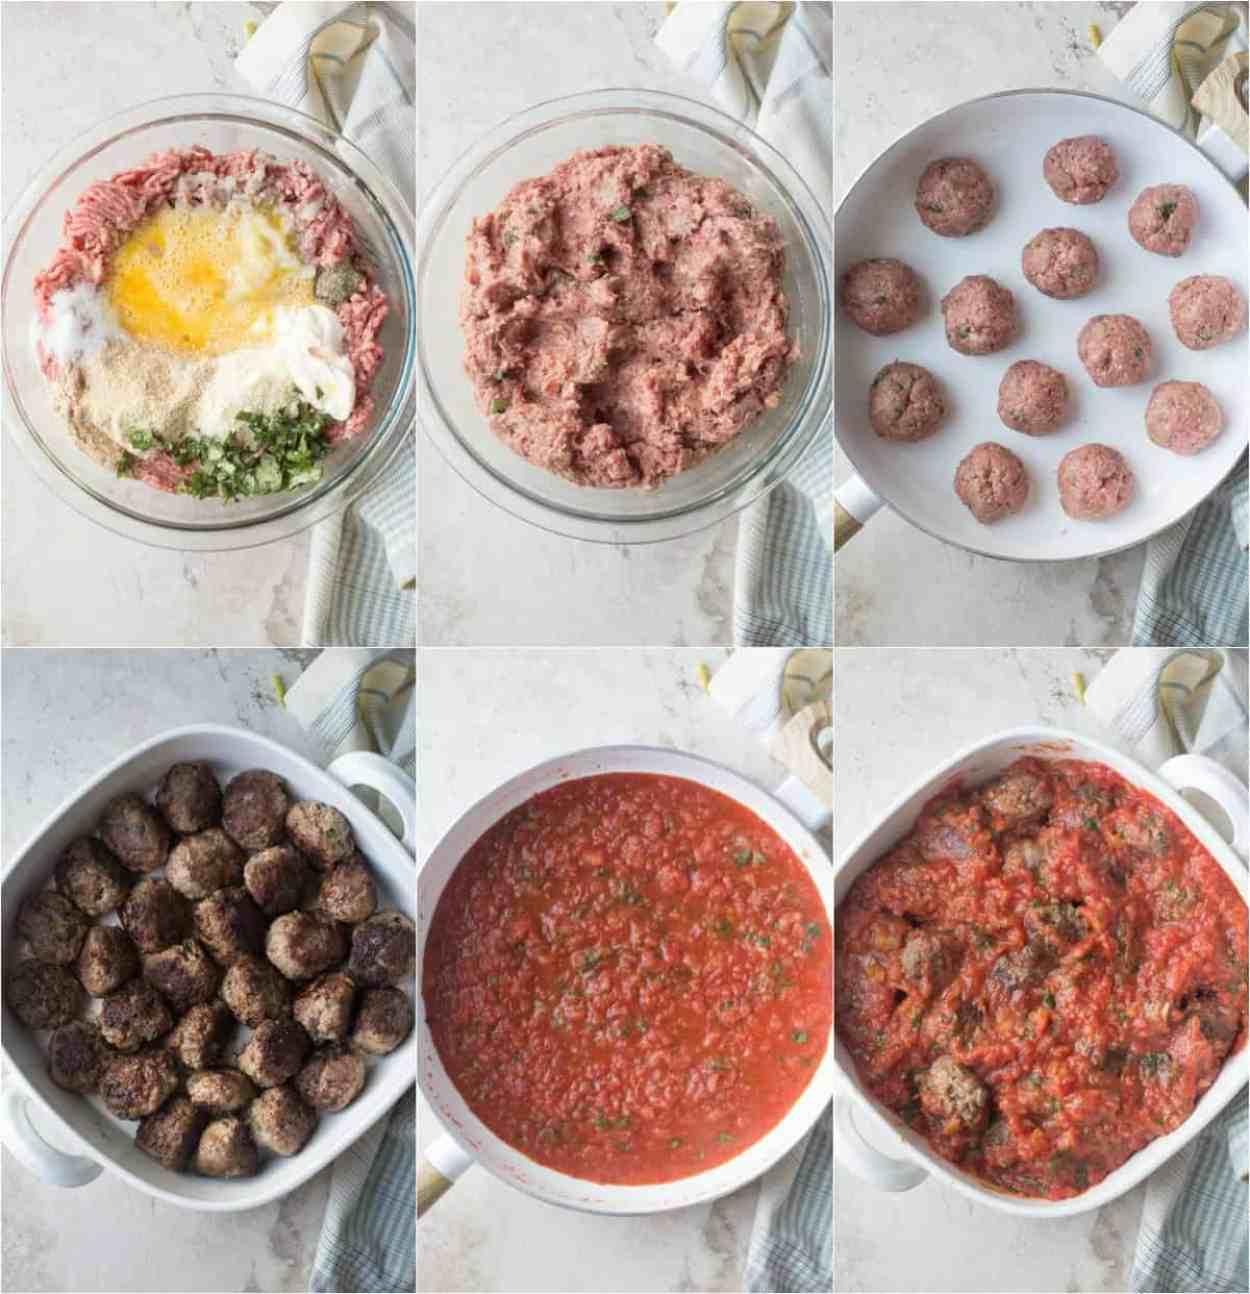 How to make meatballs recipe. Preparing the meatballs, making the homemade marinara sauce.